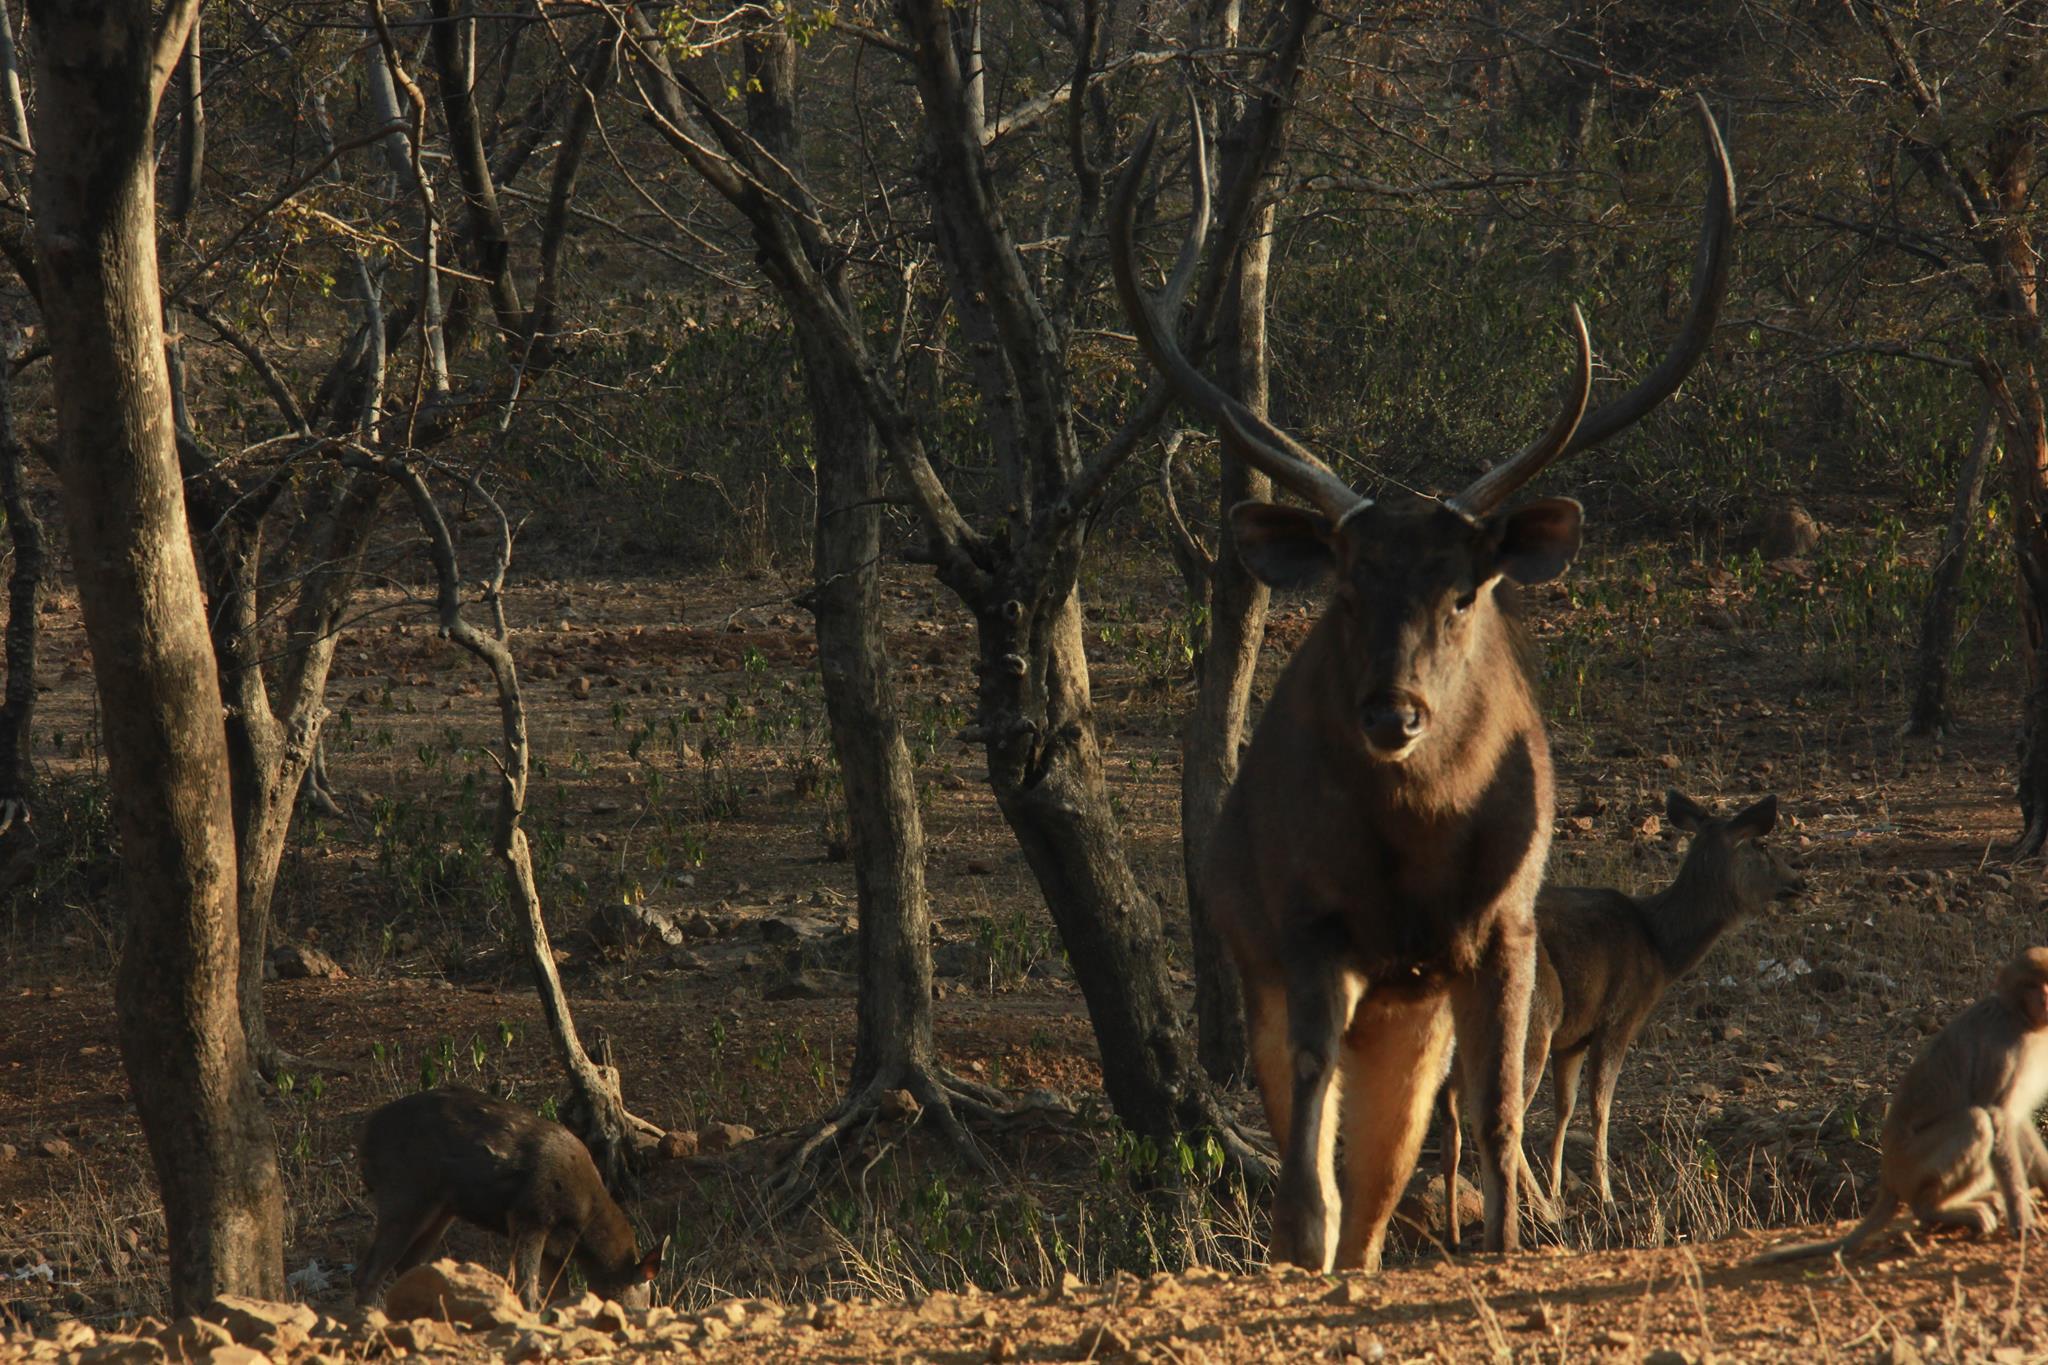 #India #Rajasthan #Siriskanationalpark